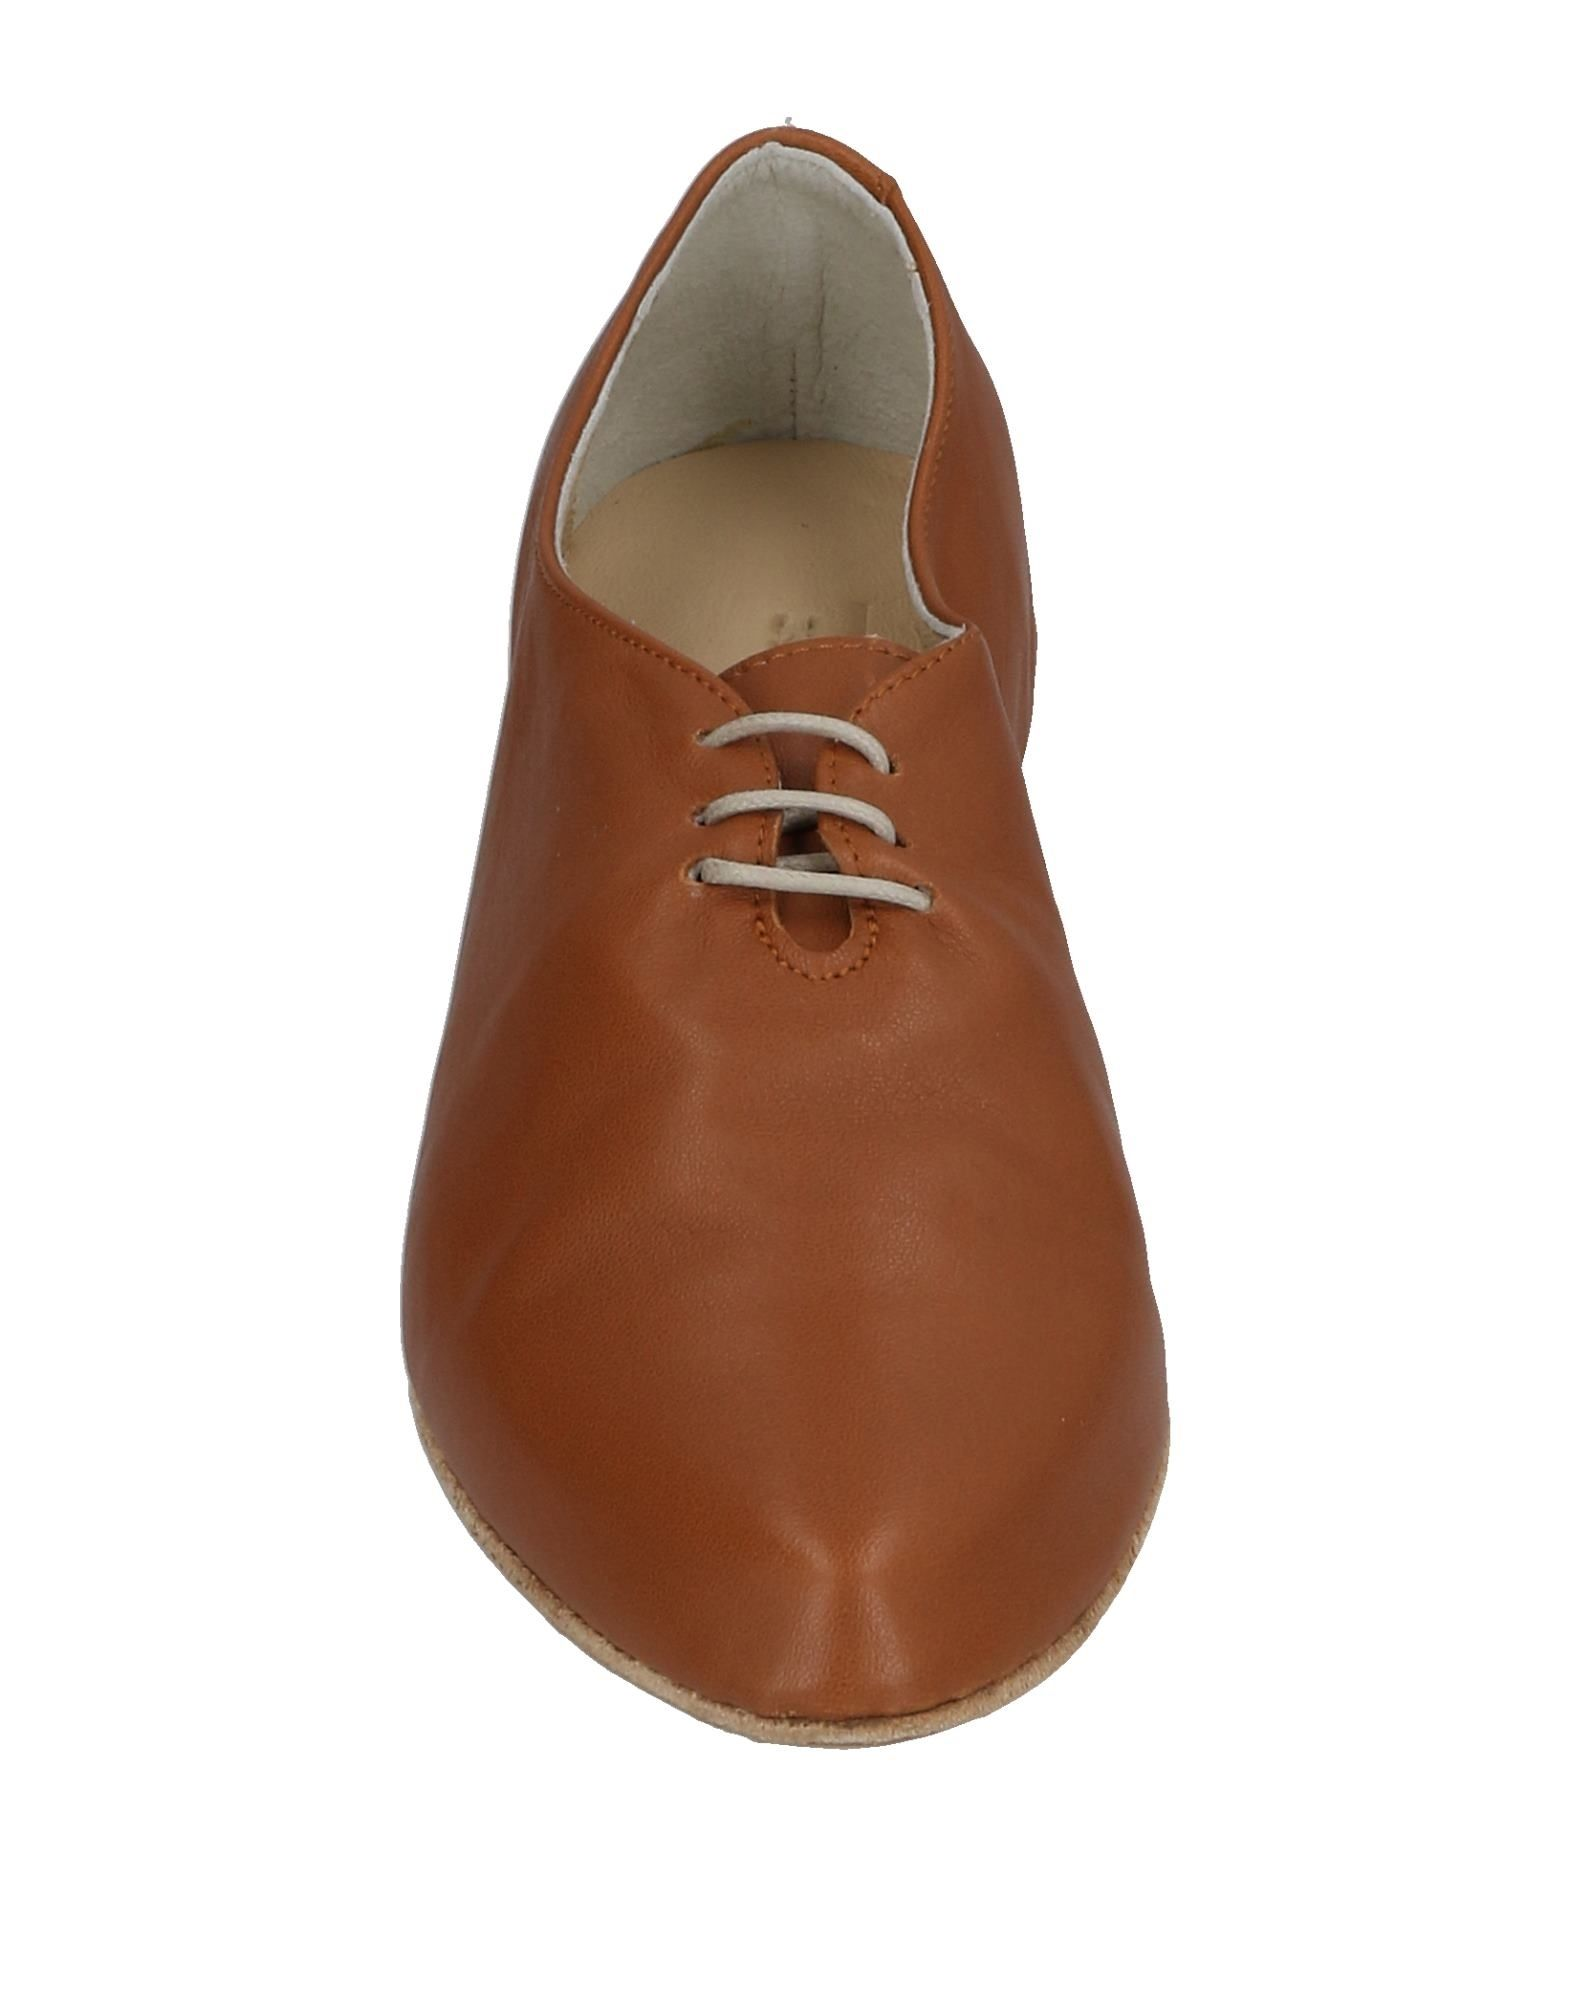 Kudetà Schnürschuhe Damen  11433773SB Schuhe Heiße Schuhe 11433773SB 8c1307